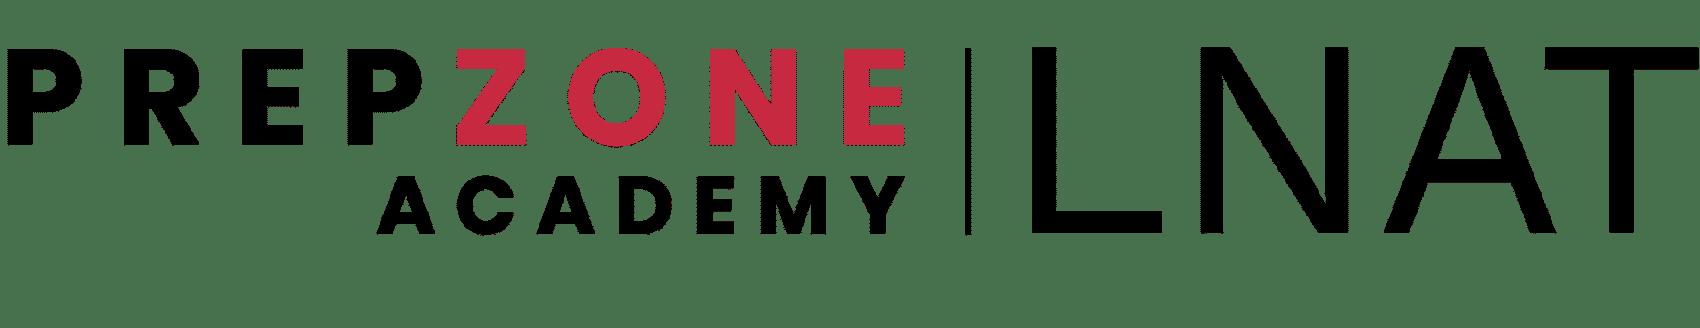 Prep Zone Academy™ | LNAT